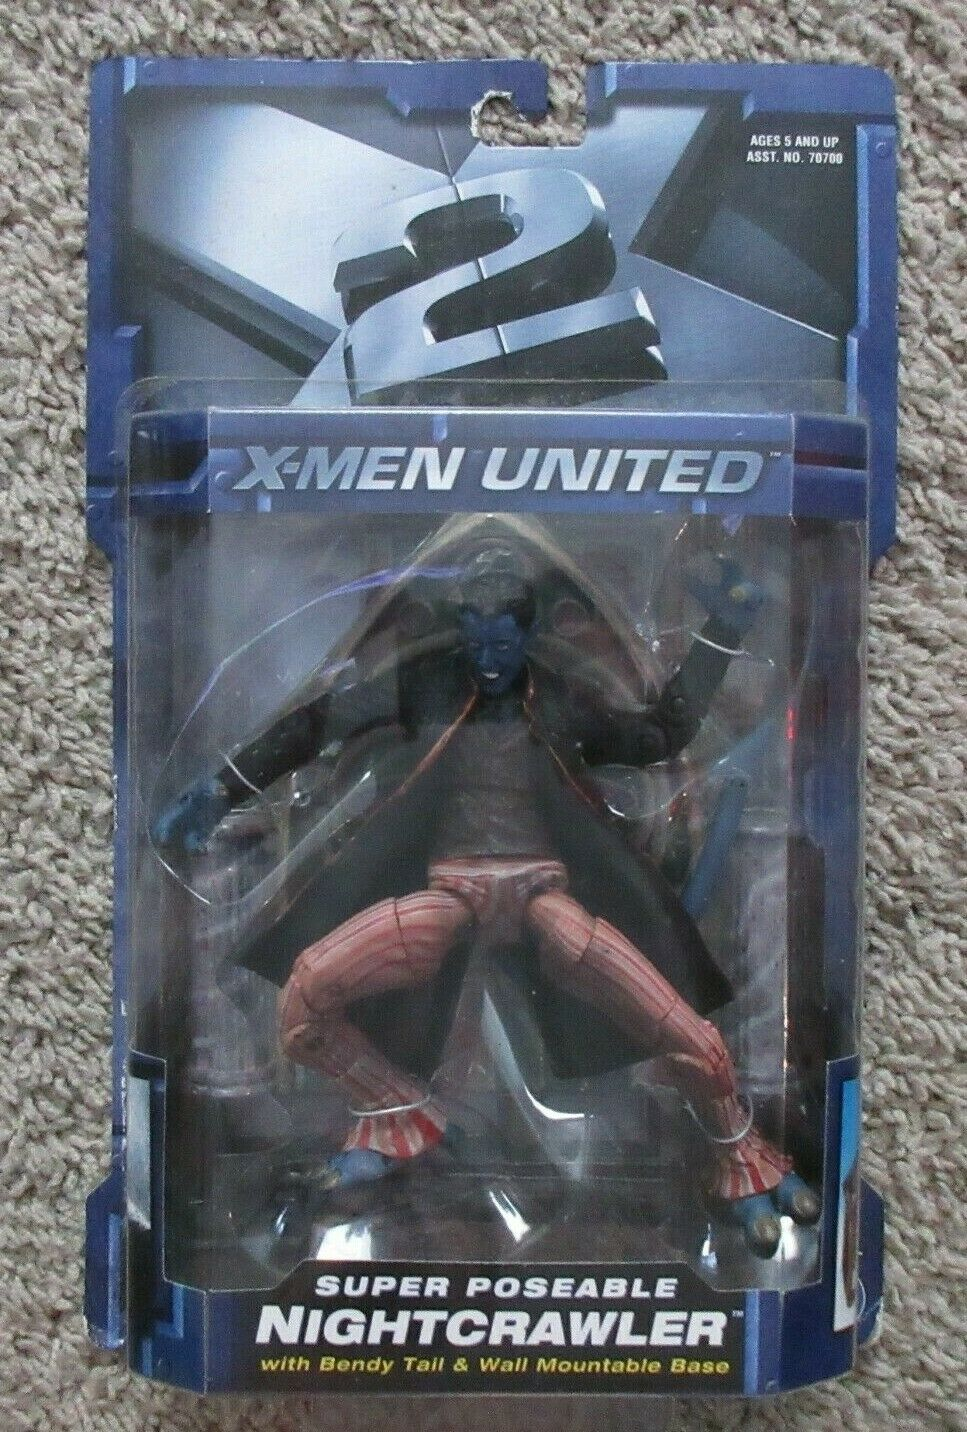 MARVEL X-MEN 2 UNITED NIGHTCRAWLER CLASSICS SERIES TOYBIZ LEGENDS RARE 6  INCH